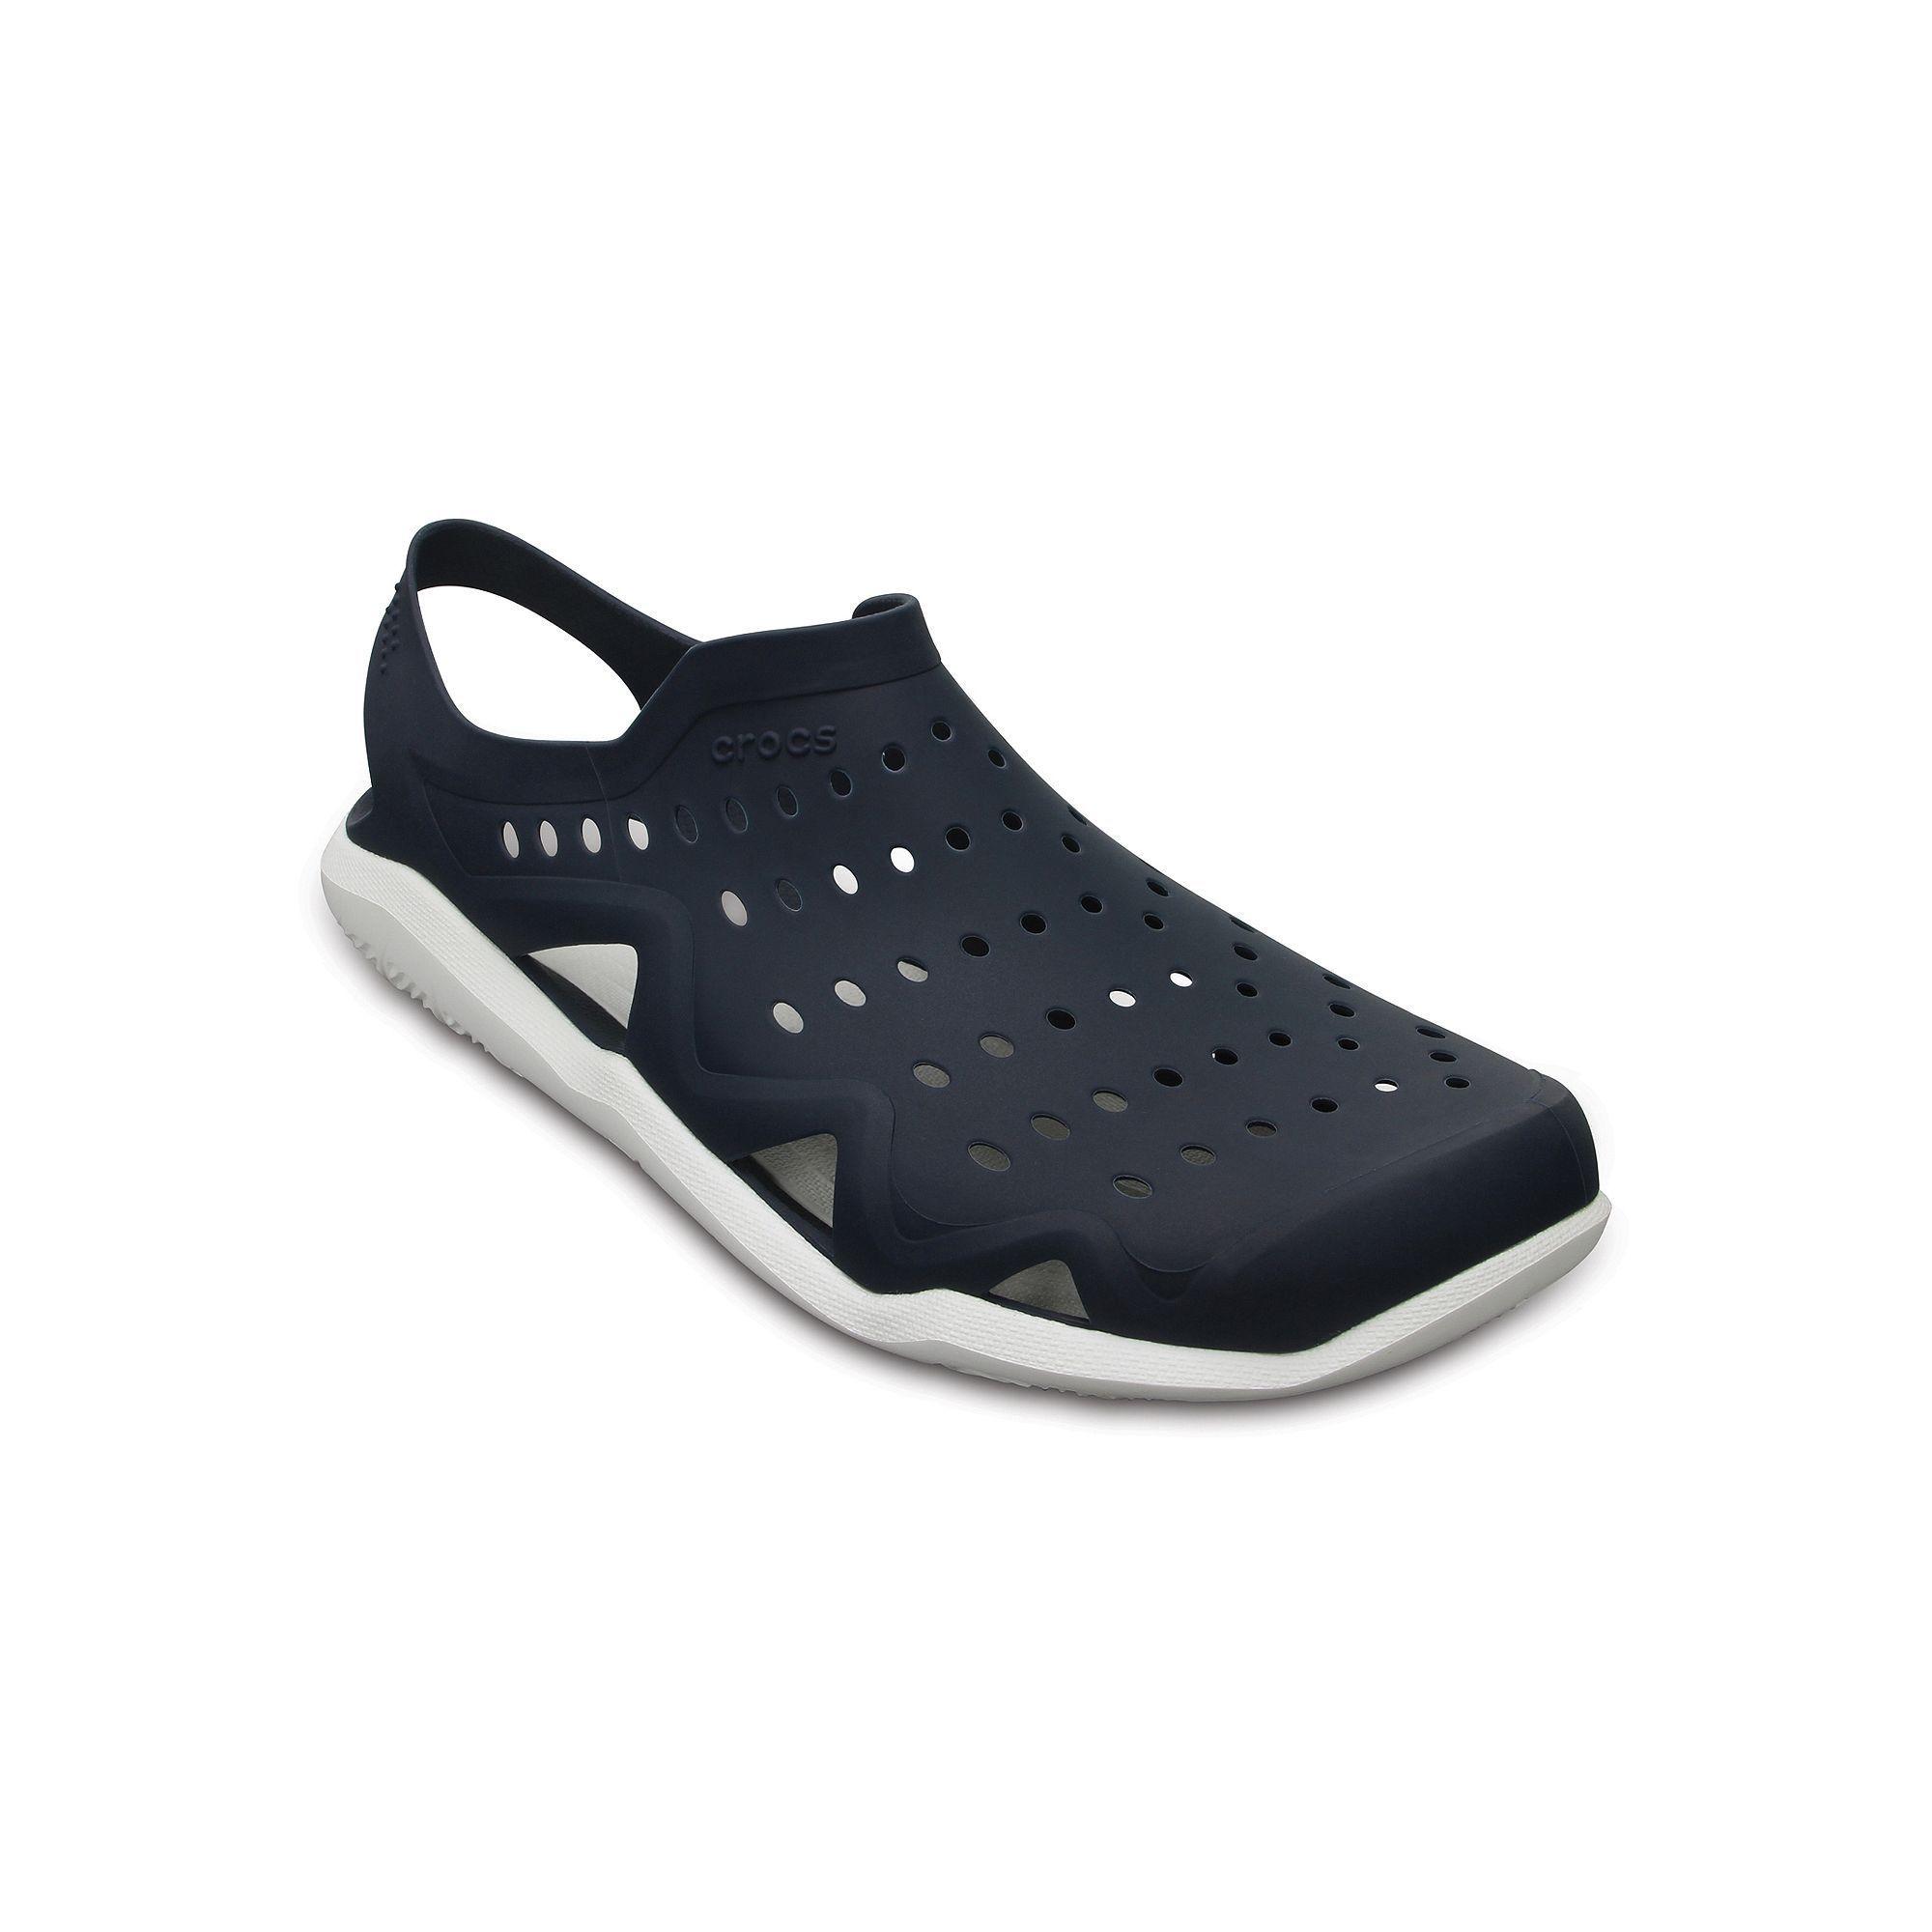 8716add0c3ffa5 Crocs Swiftwater Wave Men s Clogs